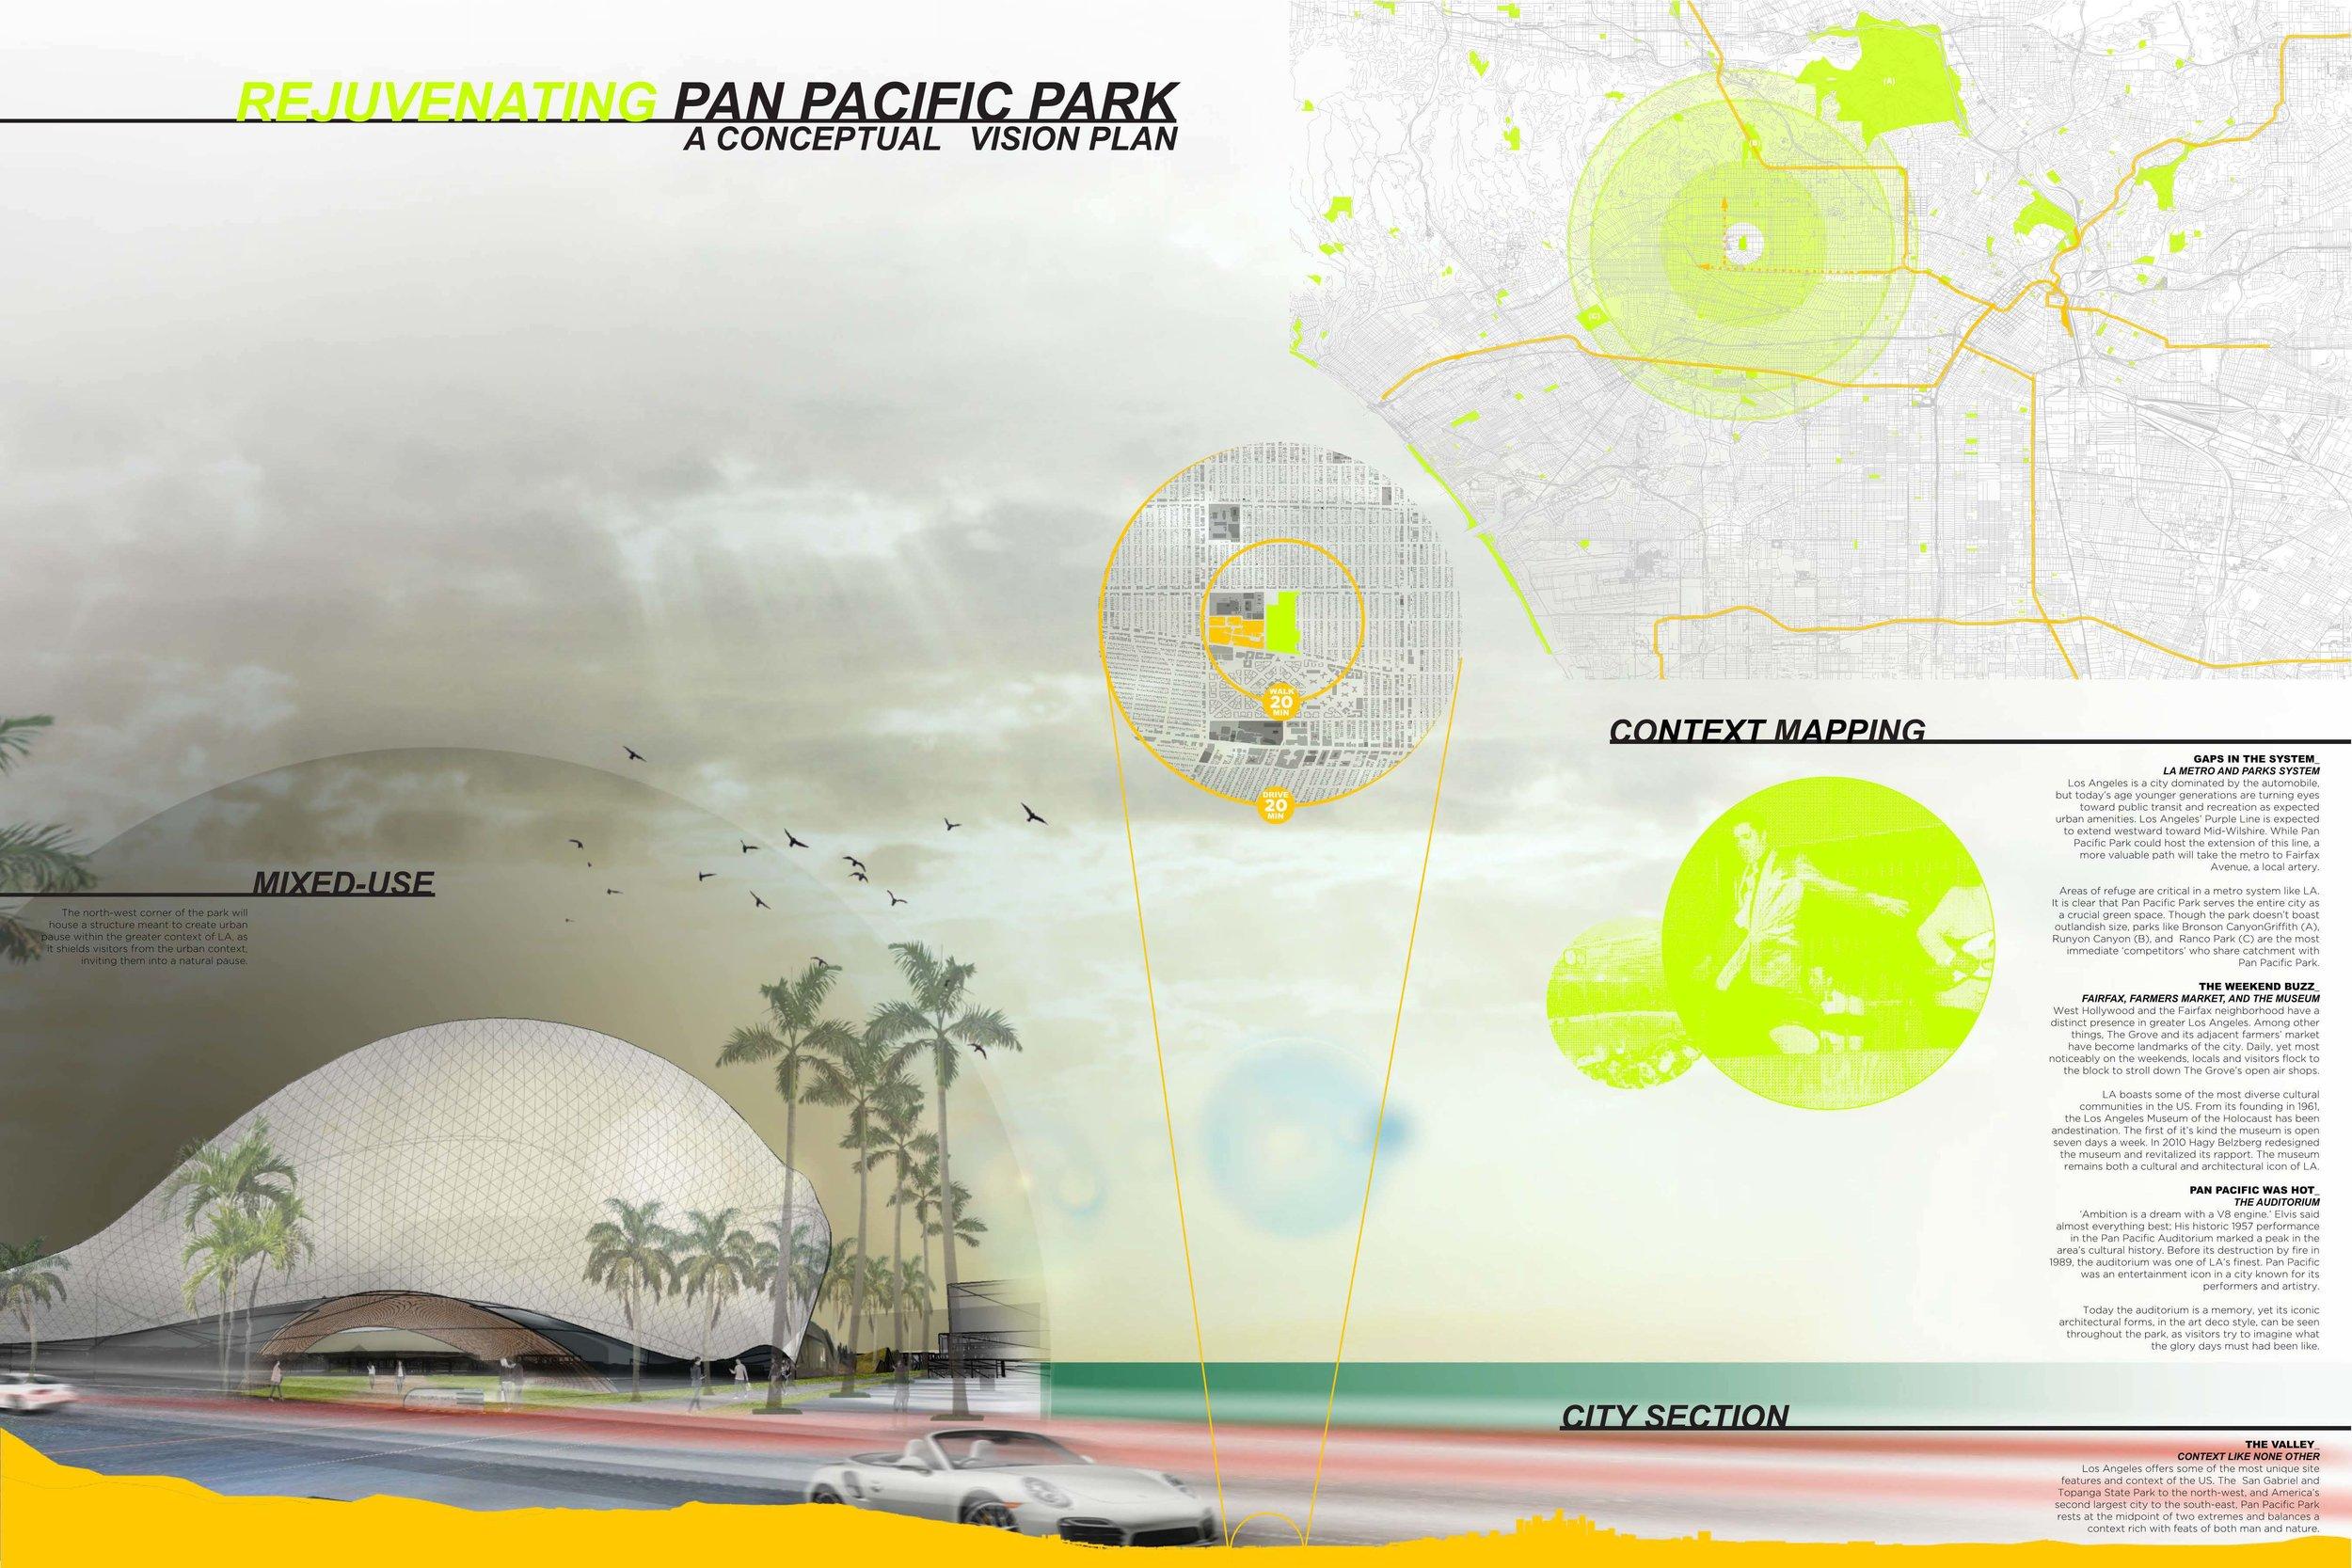 REJUVENATING PAN PACIFIC PARK_Design Presentation (SMALL)_Page_1.jpg